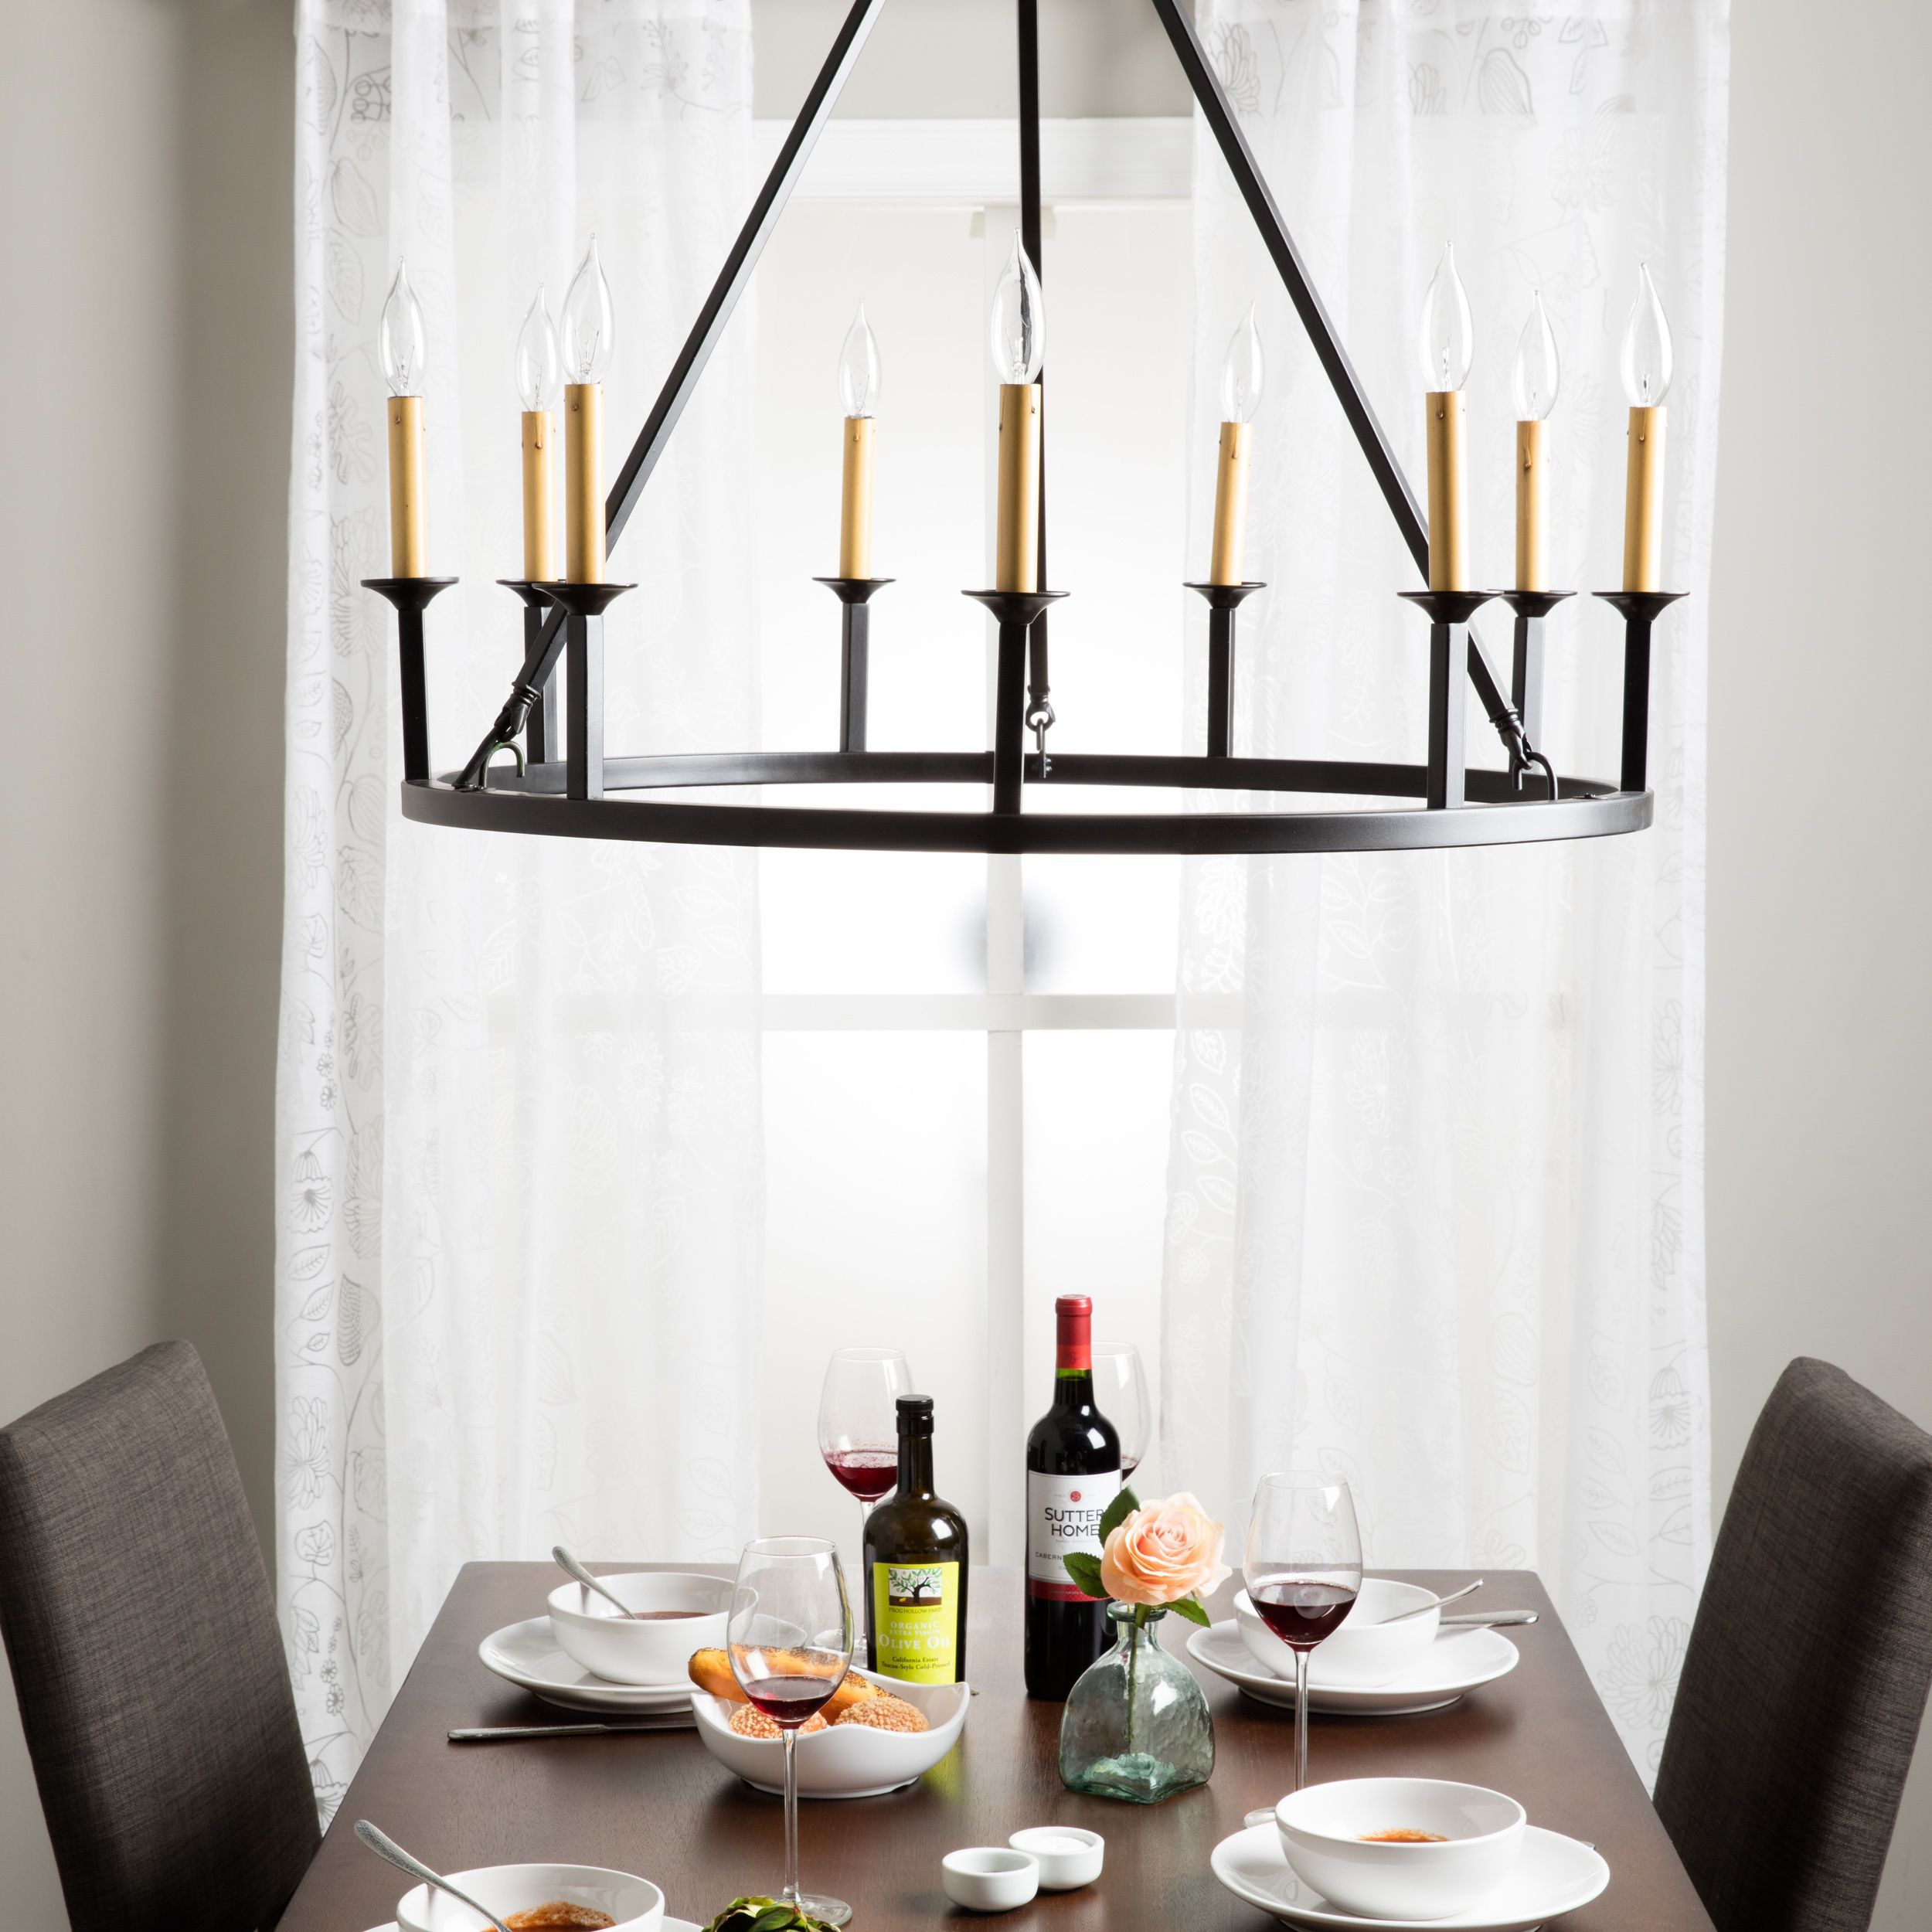 Old World Dining Room Chandeliers: Old World 9-light Chandelier, Black (Metal) In 2018